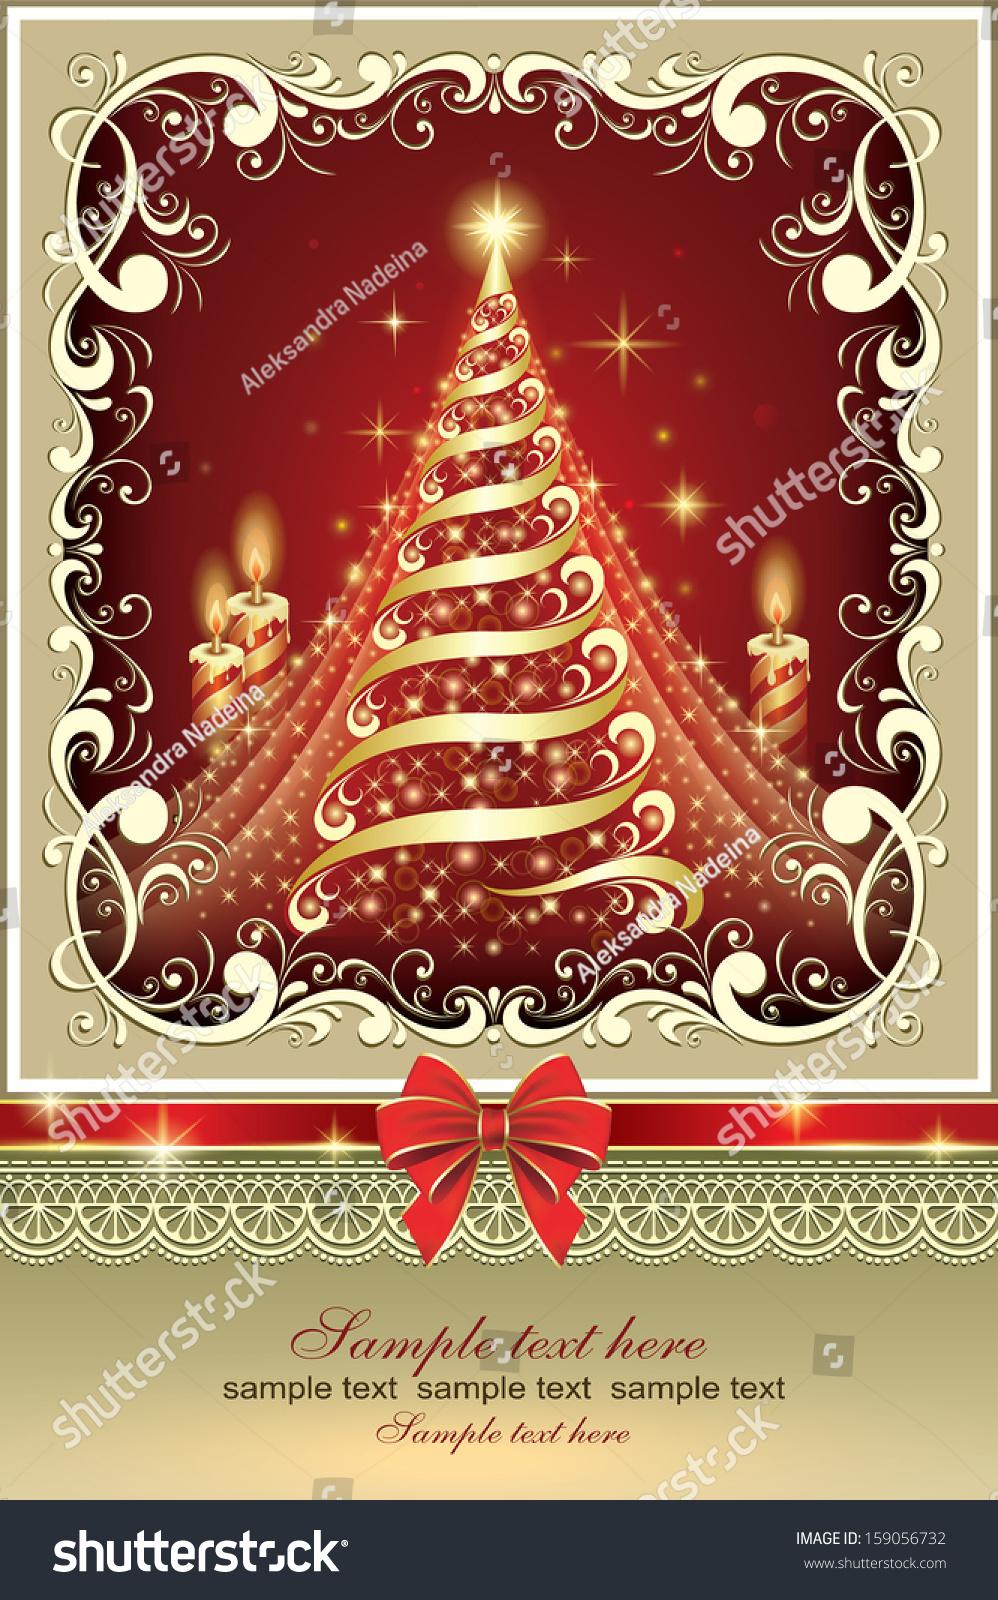 Christmas Card Christmas Tree Stock Vector 159056732 Shutterstock